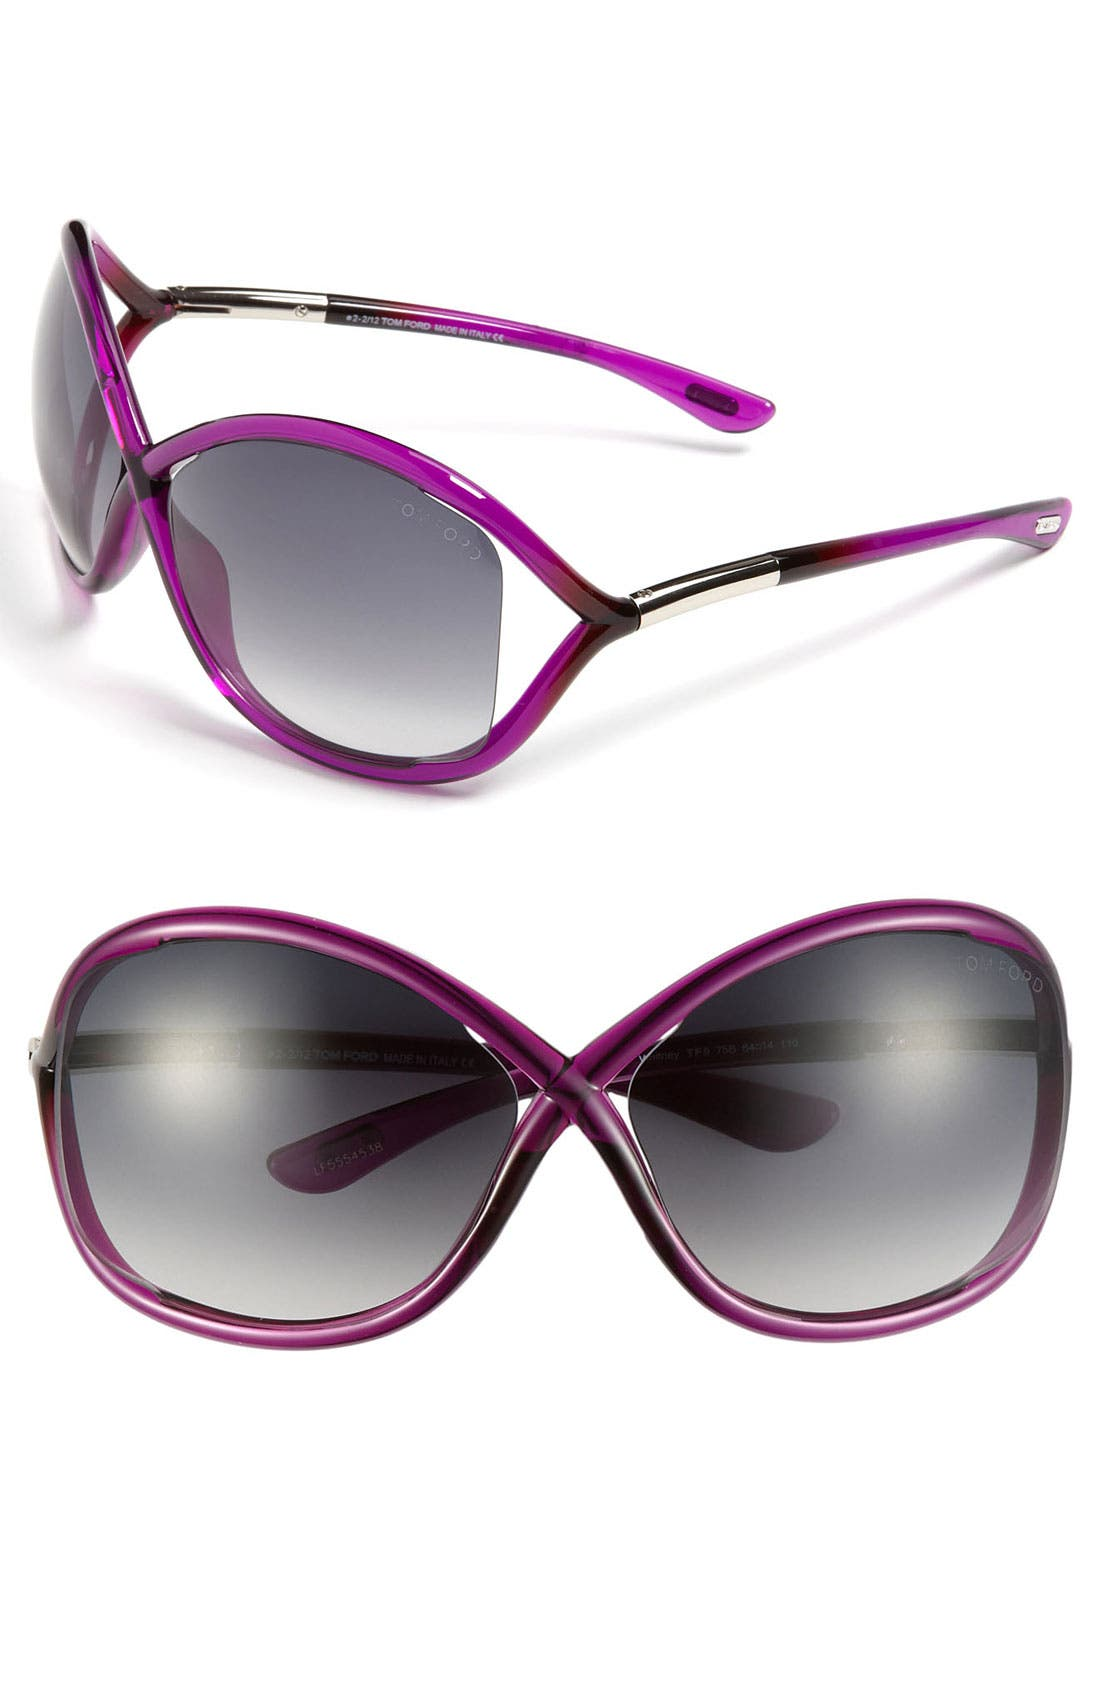 Alternate Image 1 Selected - Tom Ford 'Whitney' 64mm Sunglasses